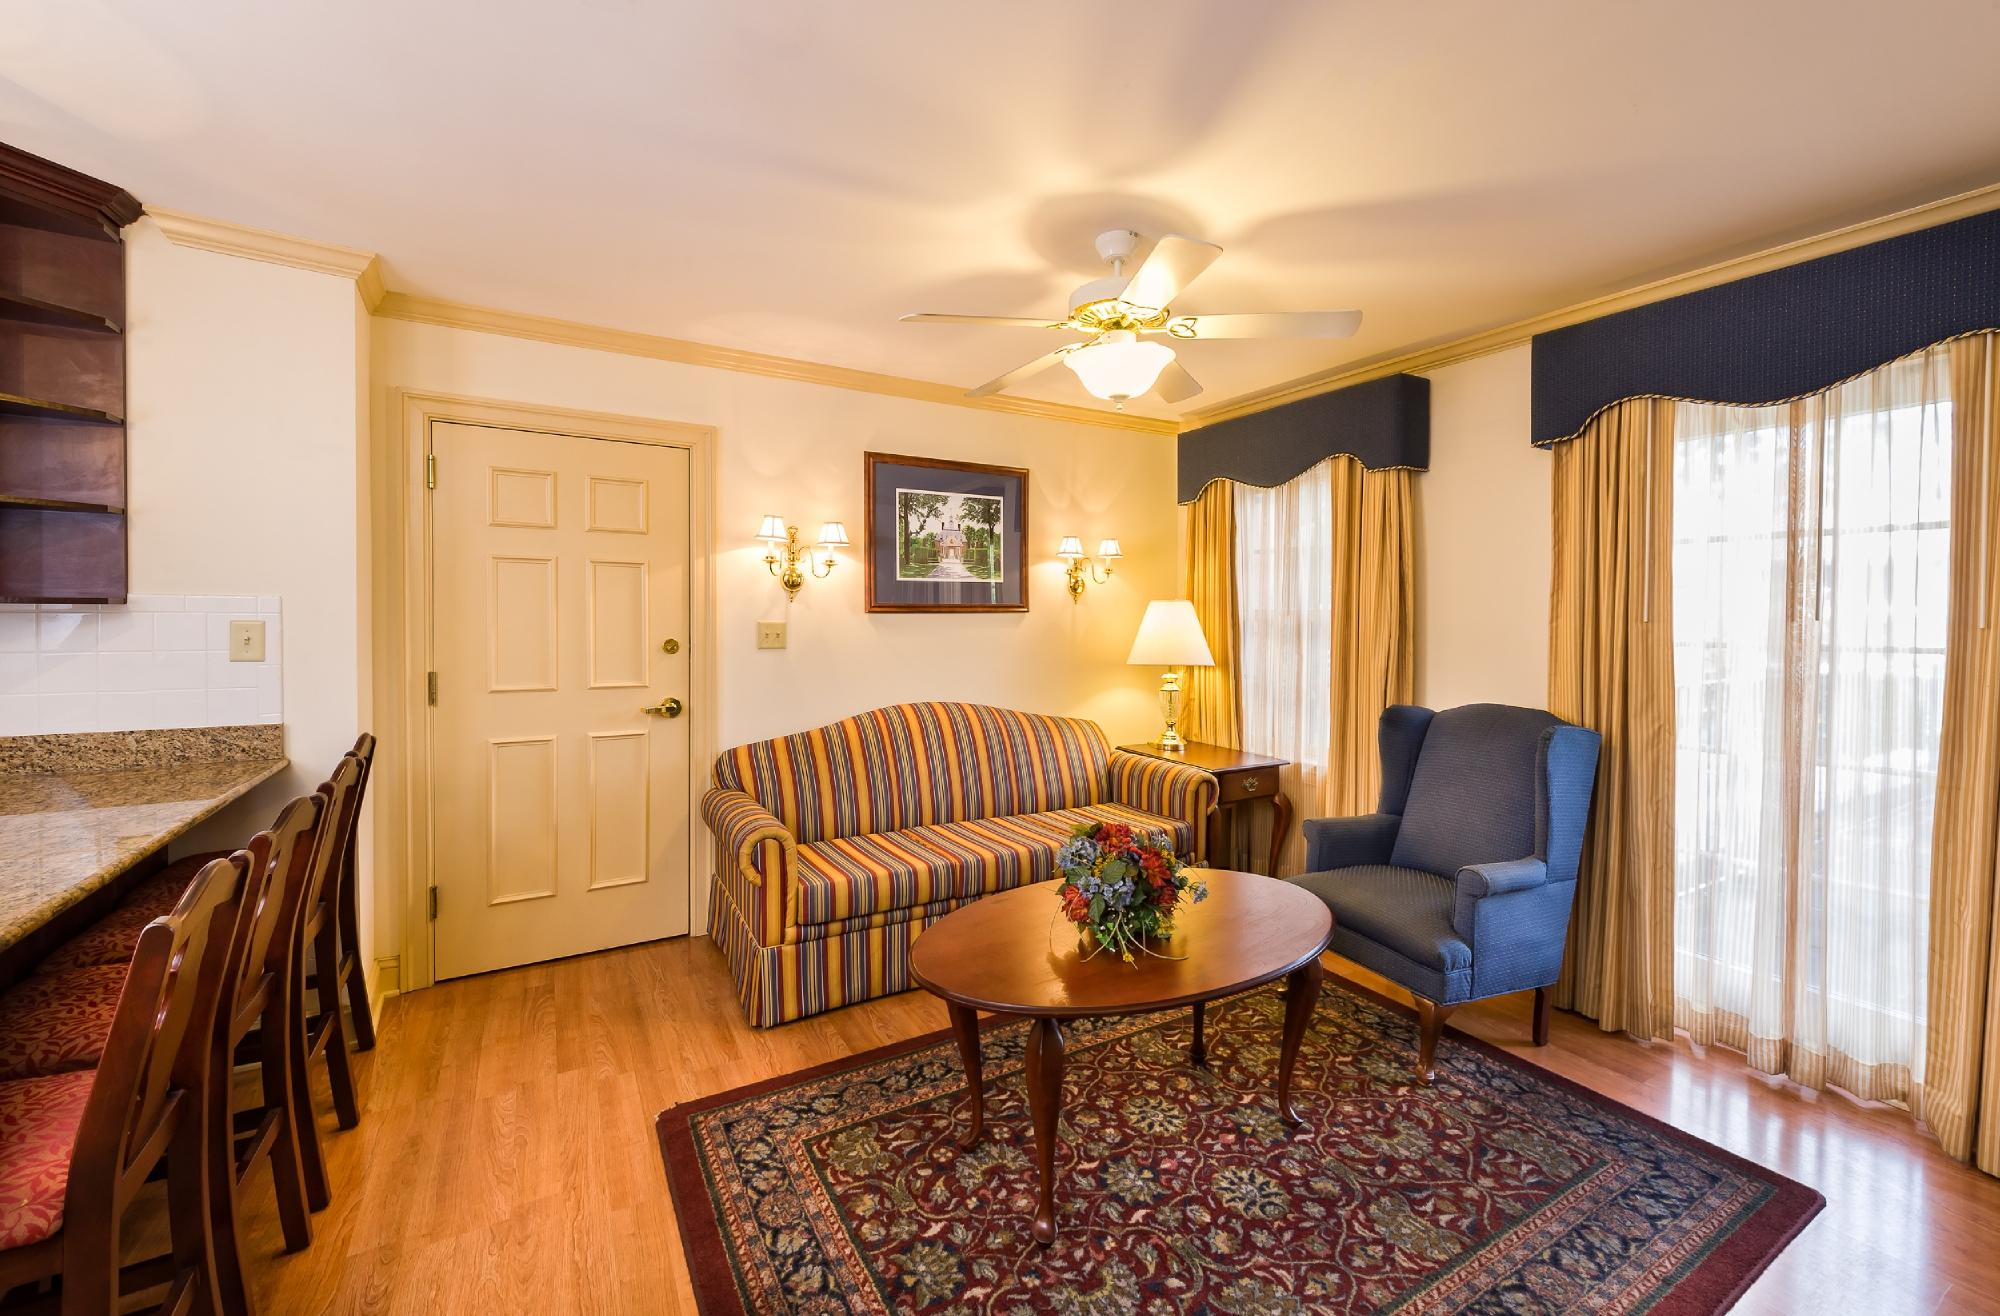 westgate historic williamsburg va 2018 hotel review family